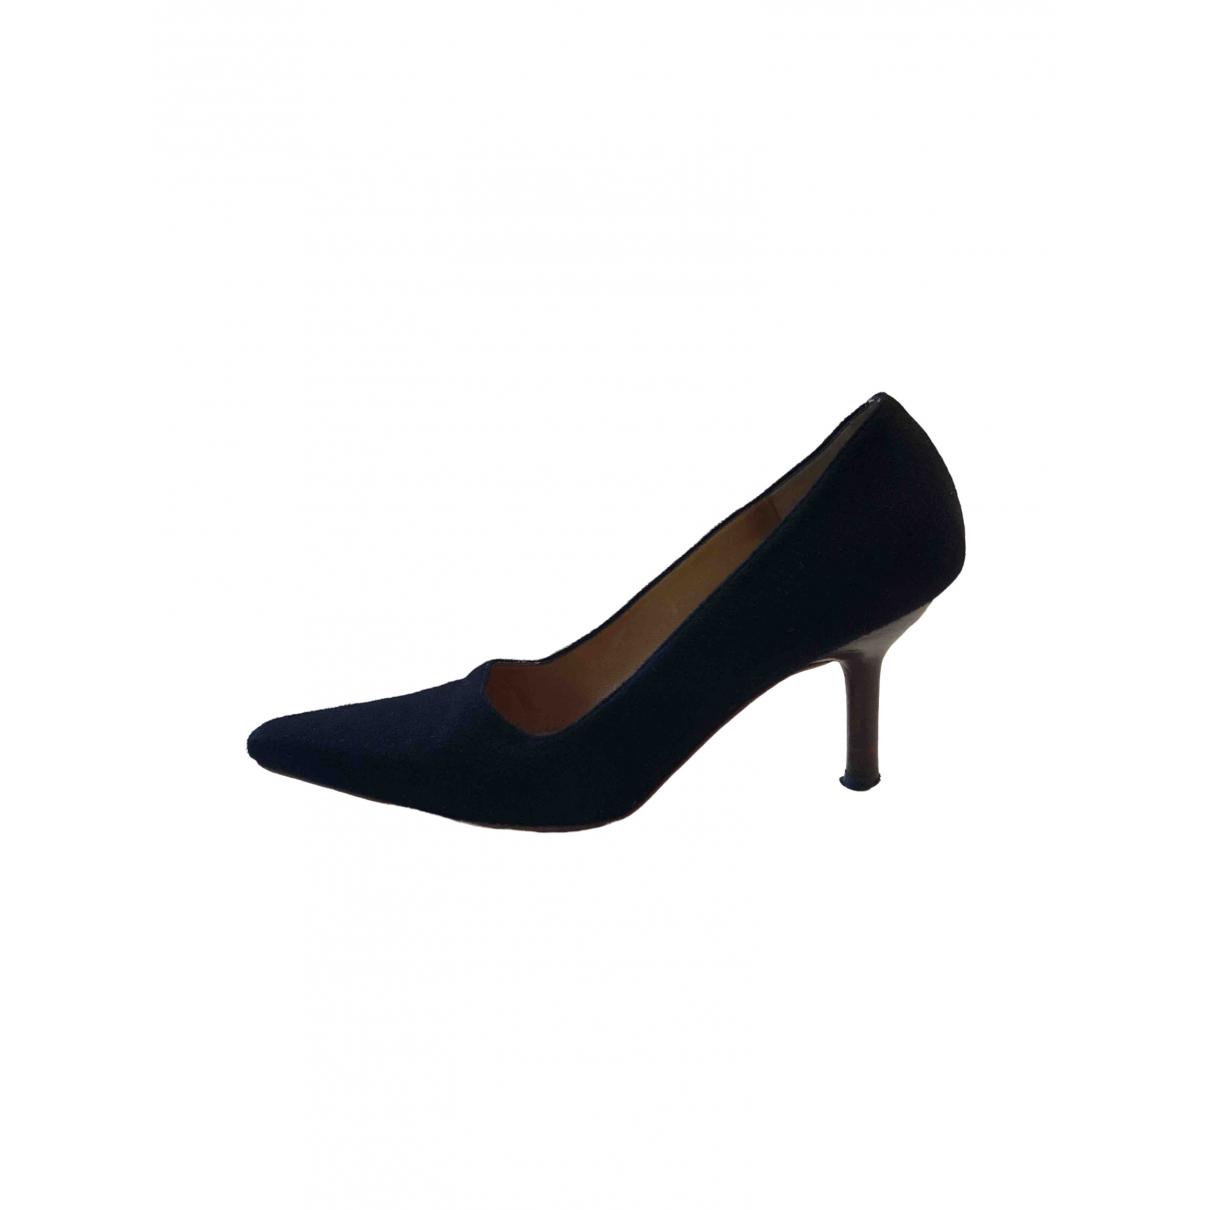 Gucci \N Black Suede Heels for Women 36.5 EU